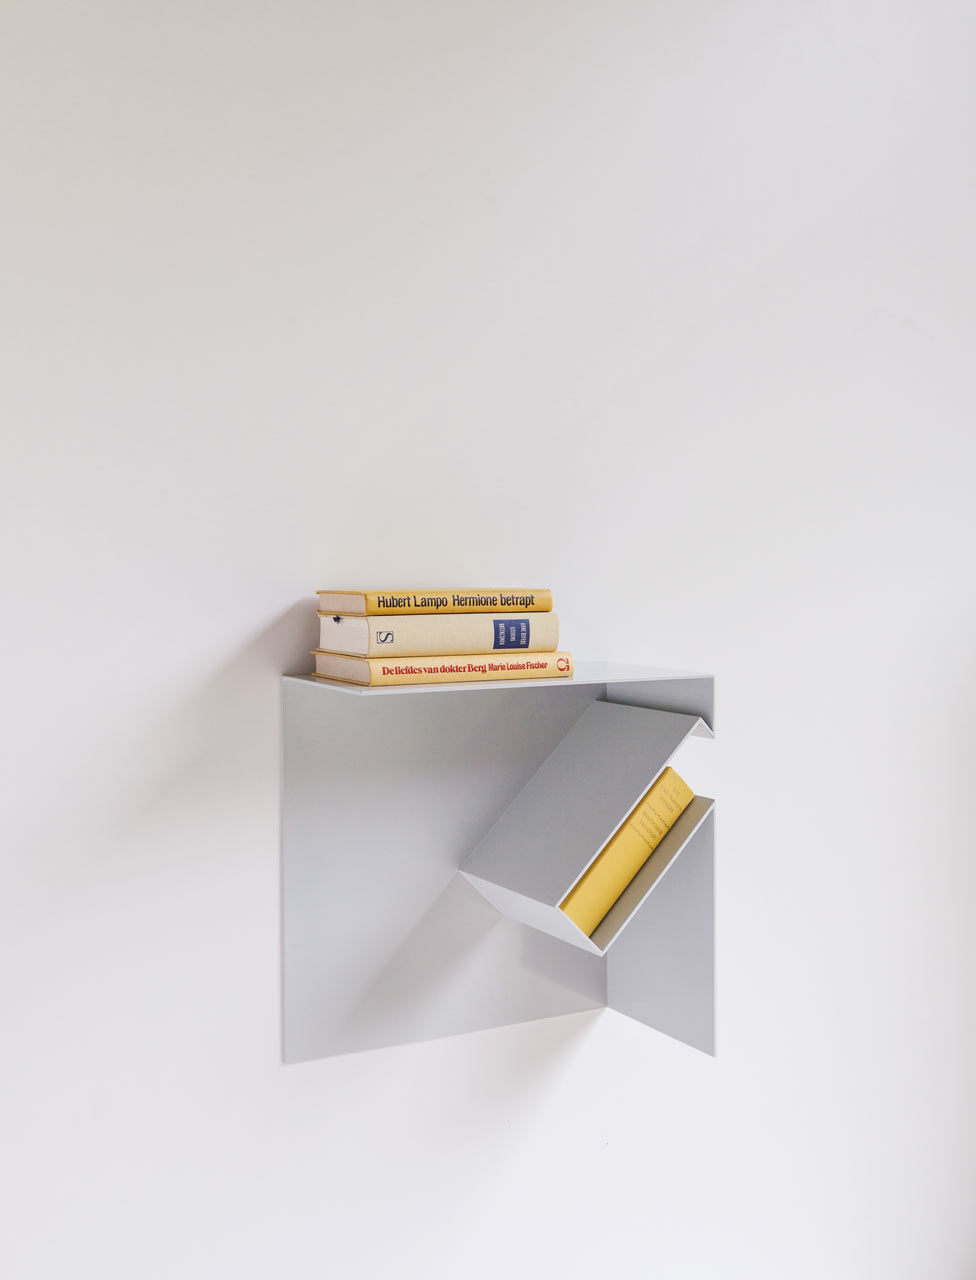 Filip-Janssens-Oblique-bookshelves-hisheji (5)